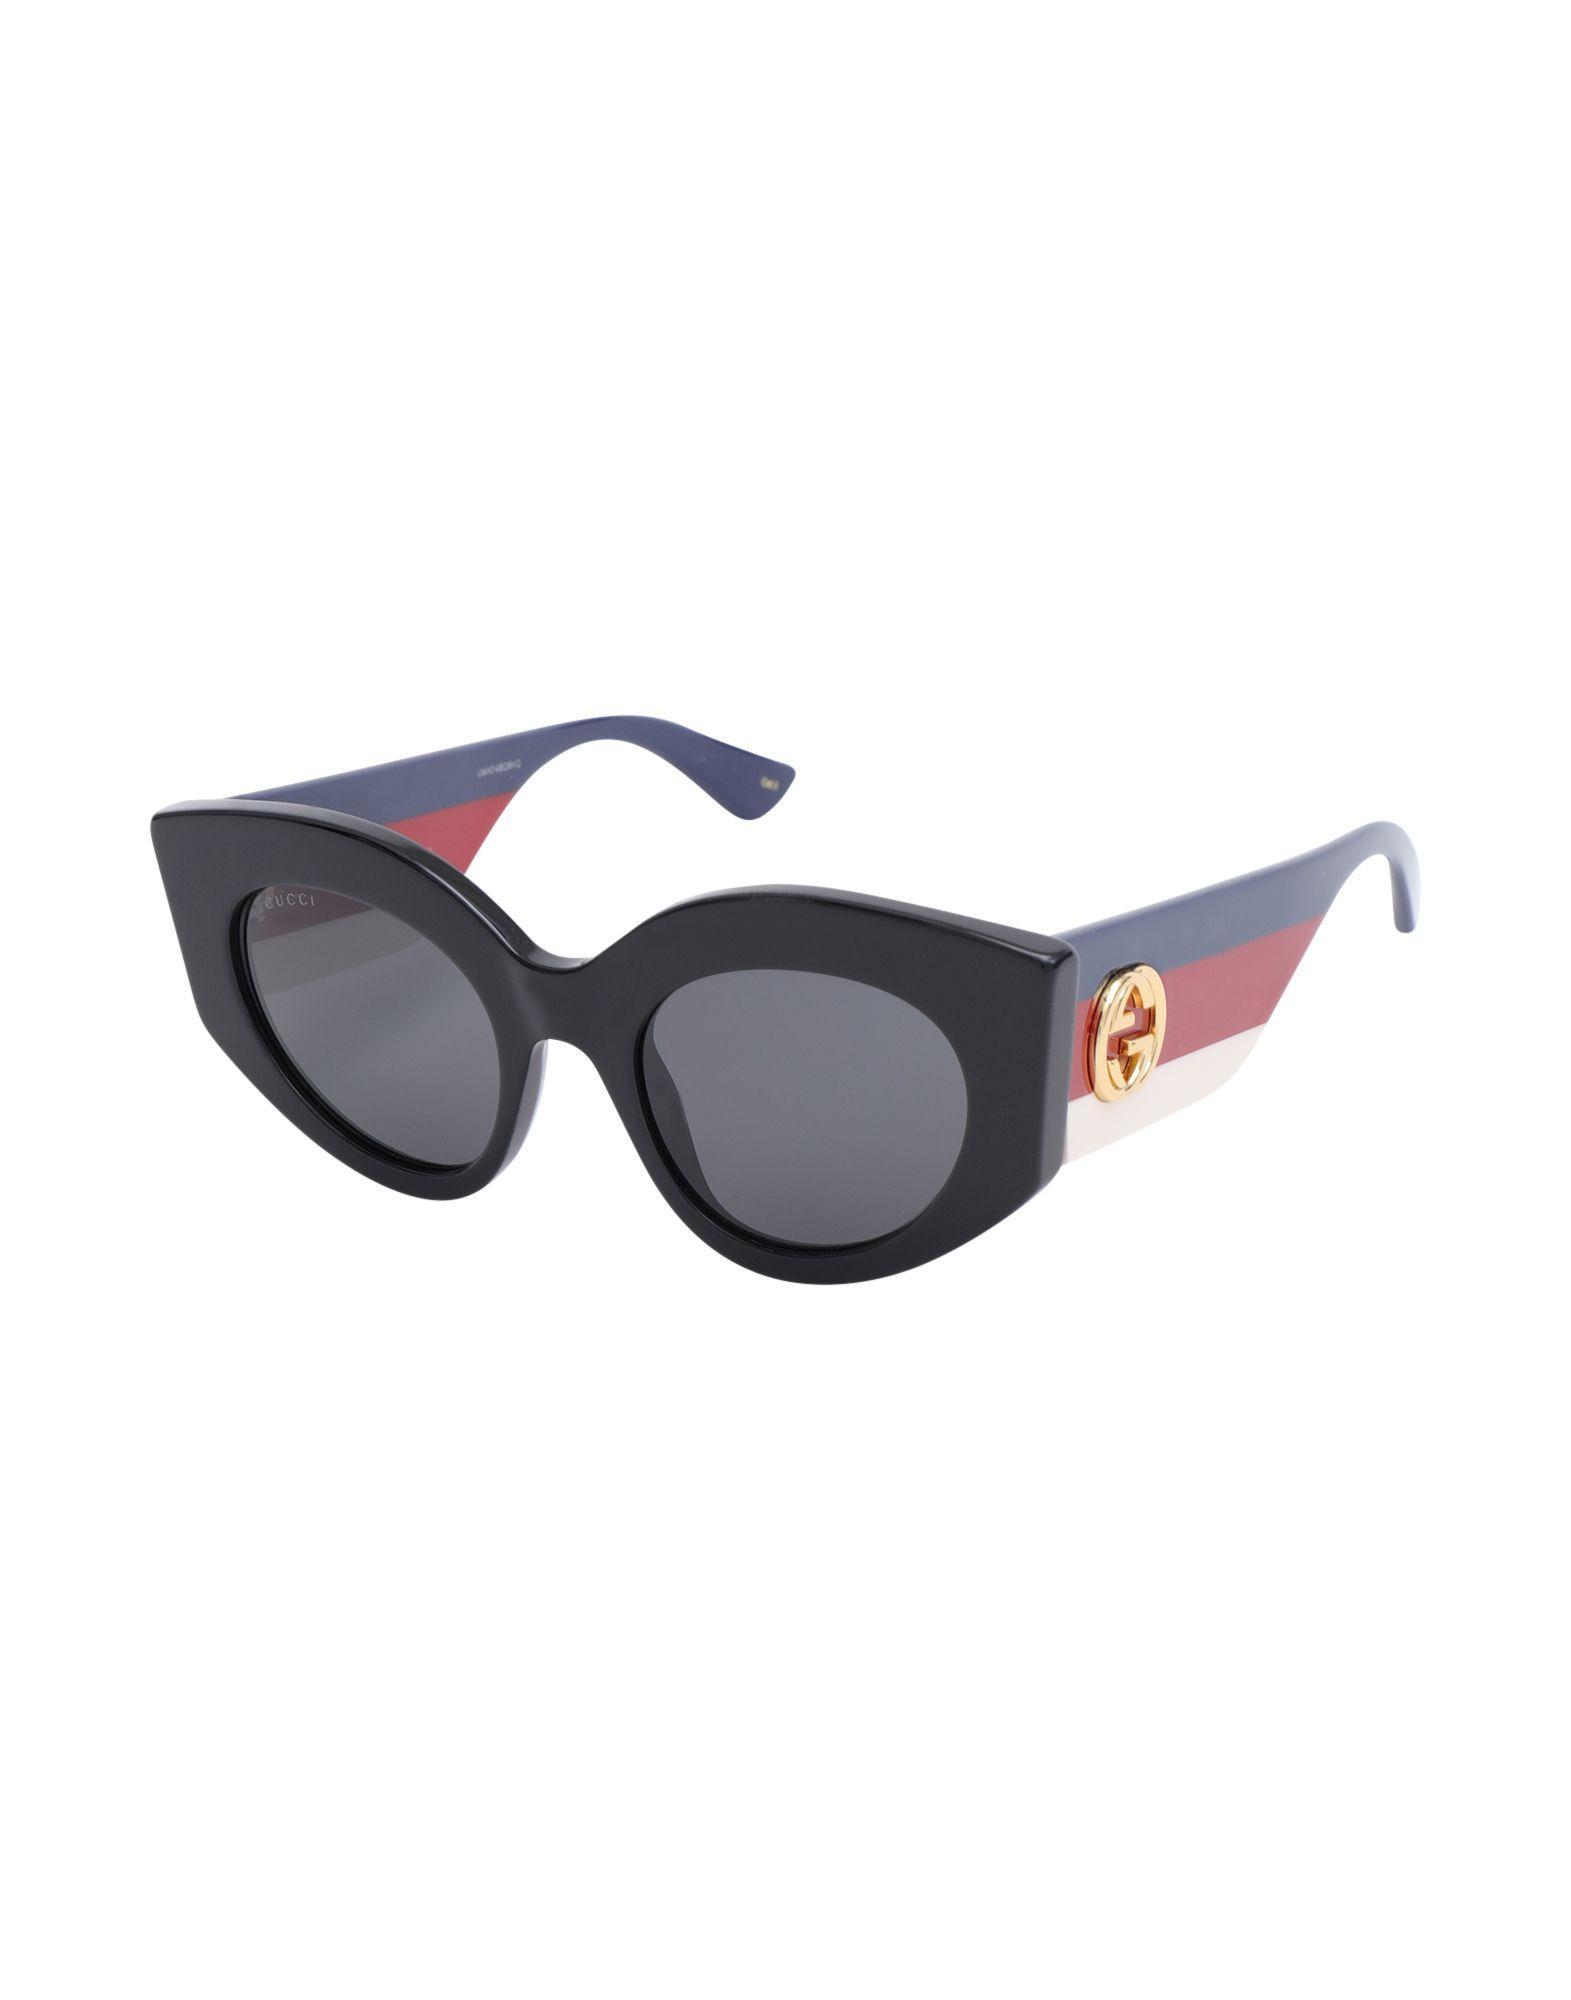 99df954bbc2 Gucci - Black Sunglasses - Lyst. View fullscreen